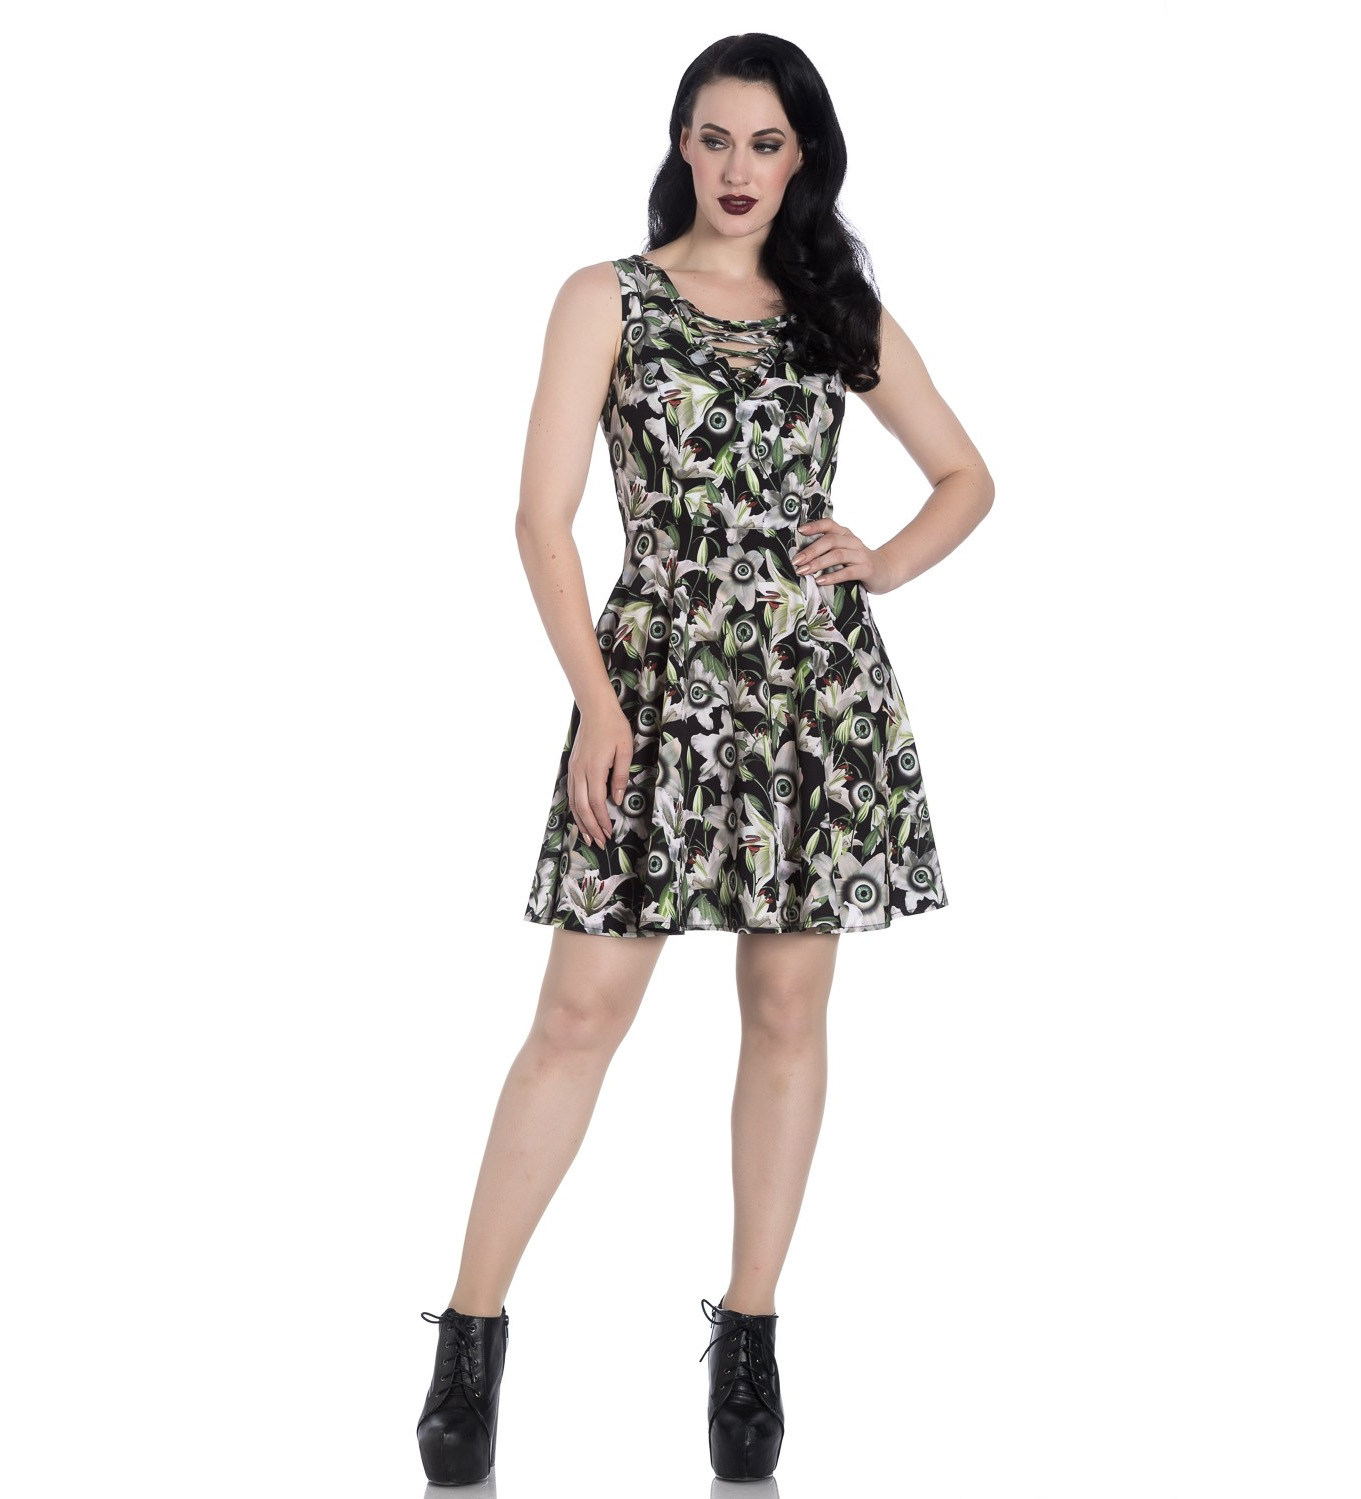 Hell-Bunny-Black-Lace-Up-Goth-Punk-Mini-Dress-PEEPERS-Eyeballs-Flowers-All-Sizes thumbnail 33